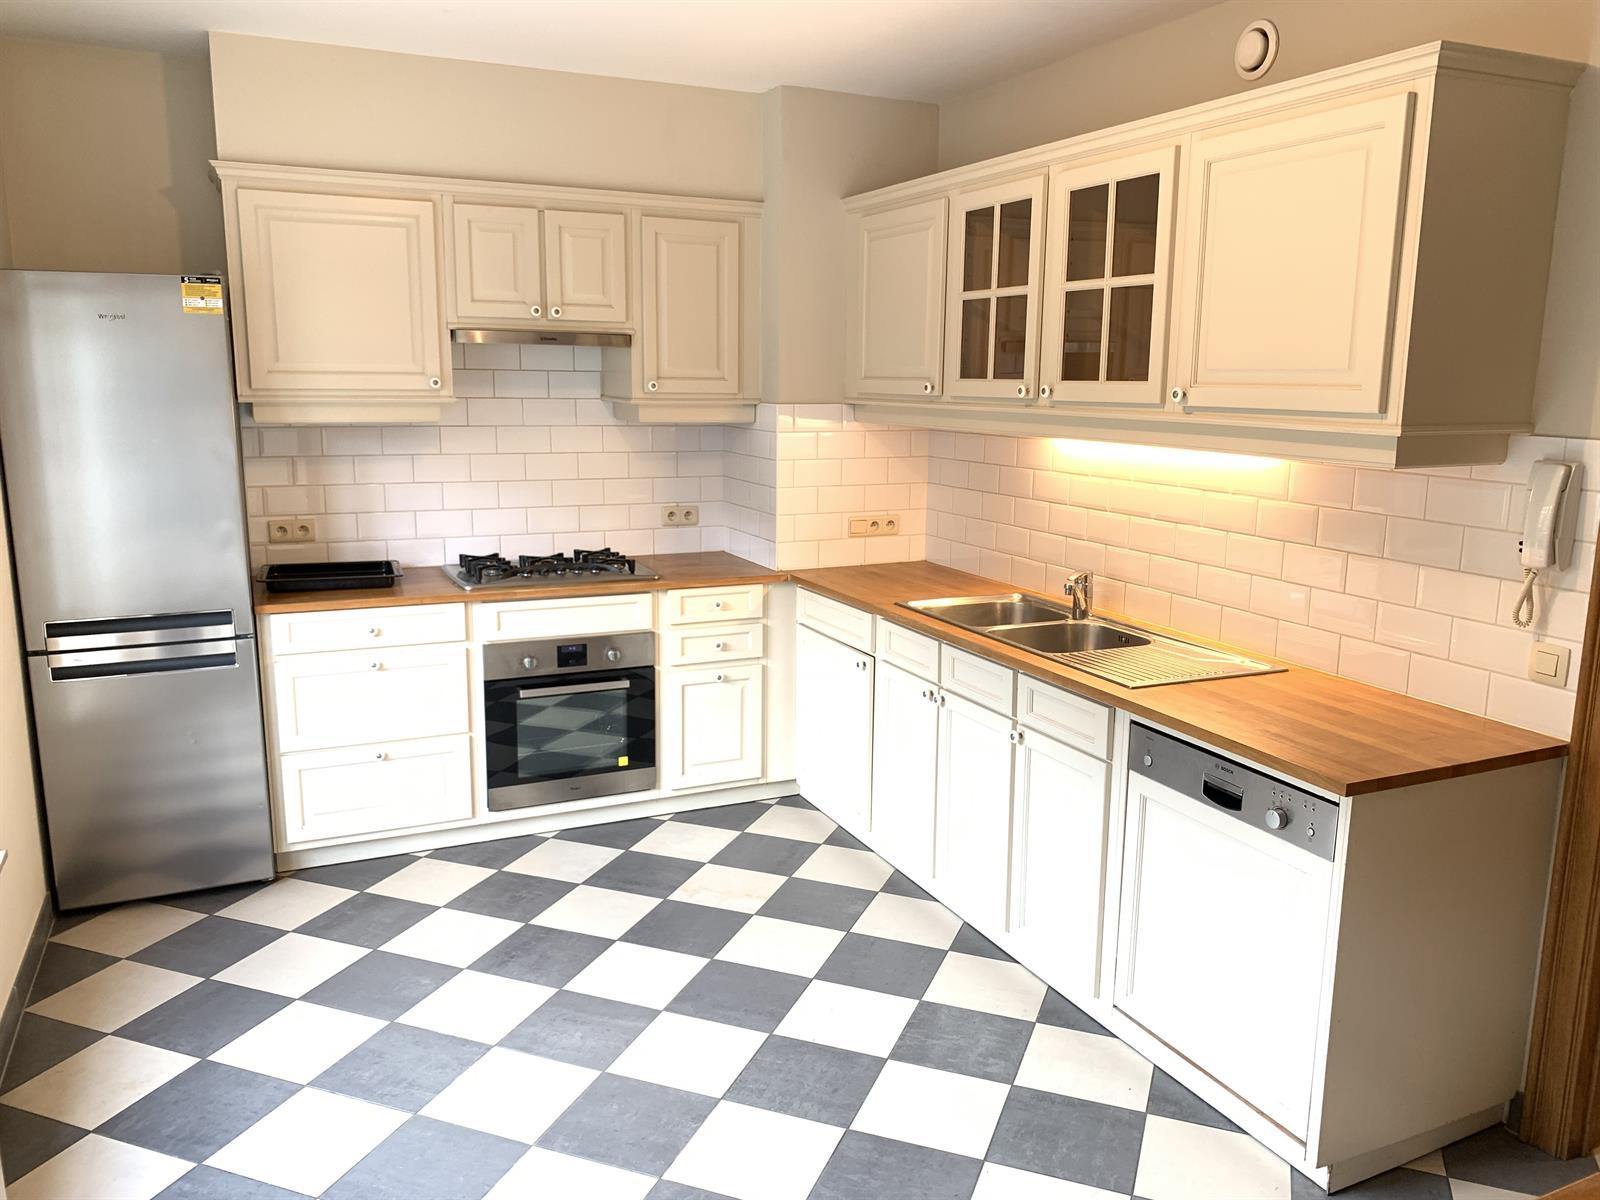 Appartement exceptionnel - Woluwe-Saint-Pierre - #4433539-23